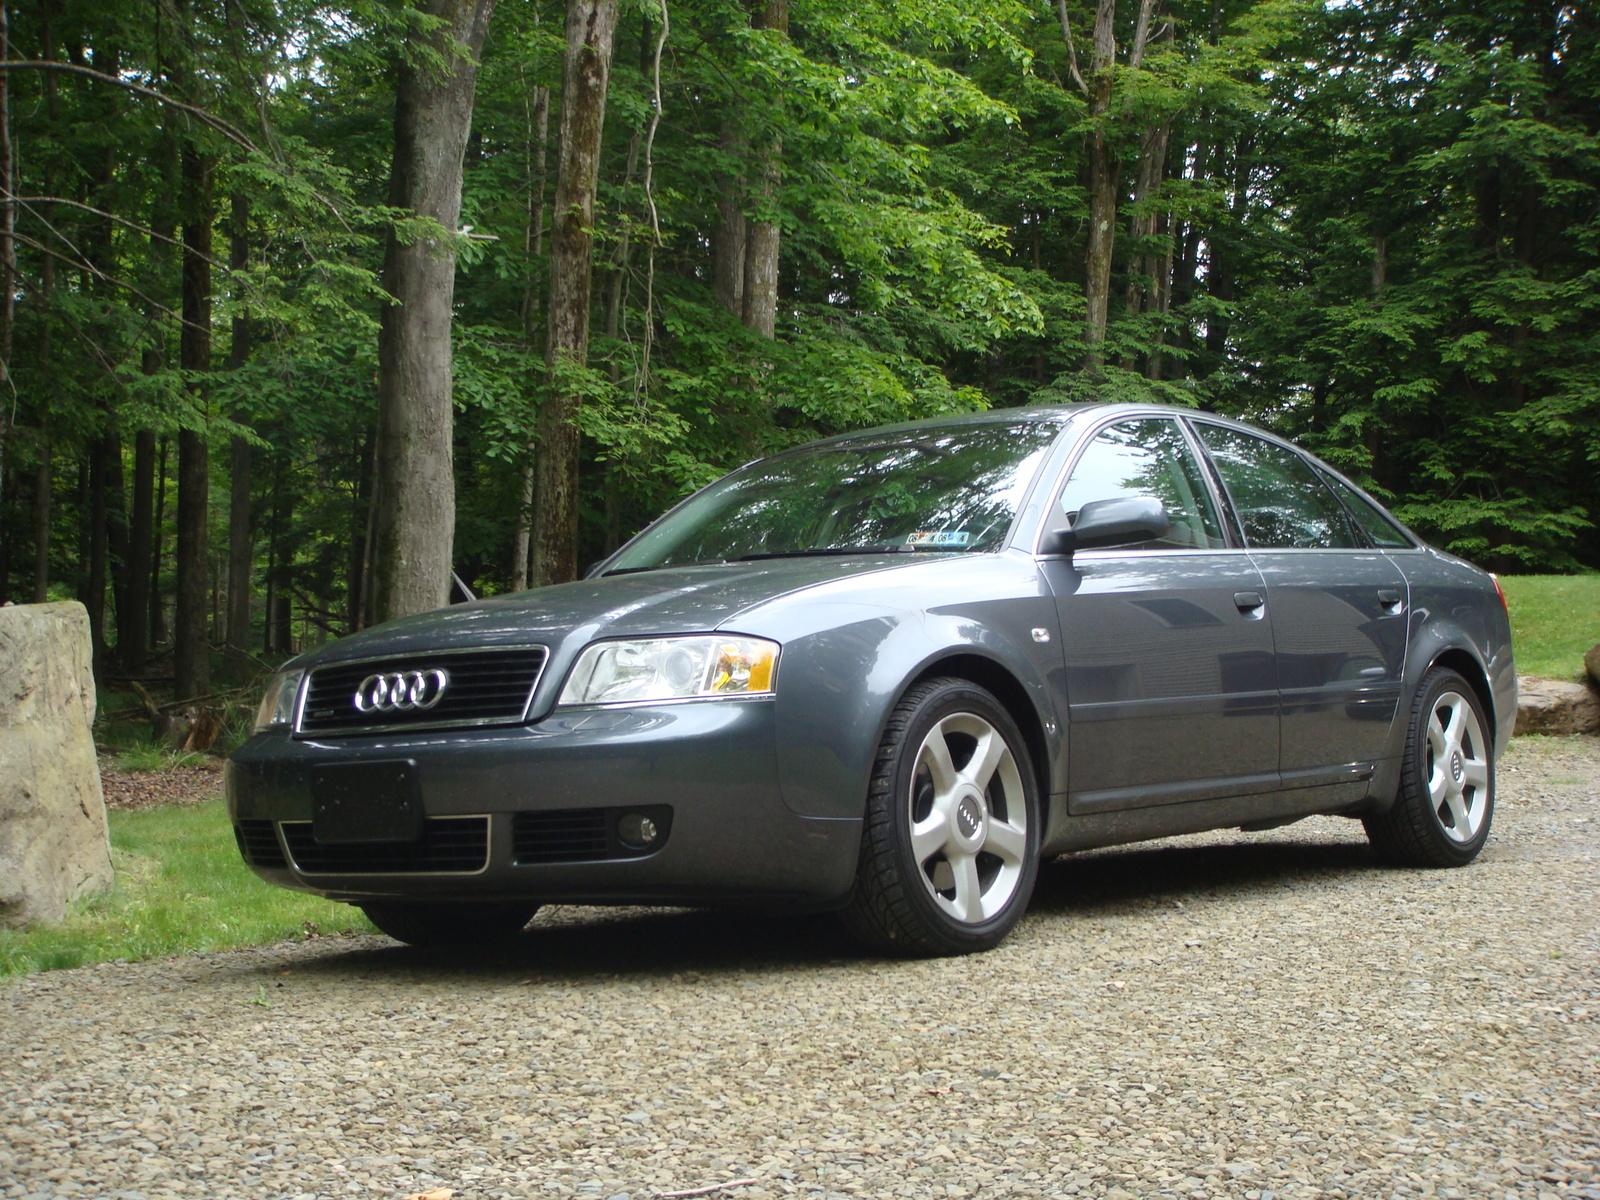 2004 Audi A6 - Overview - CarGurus